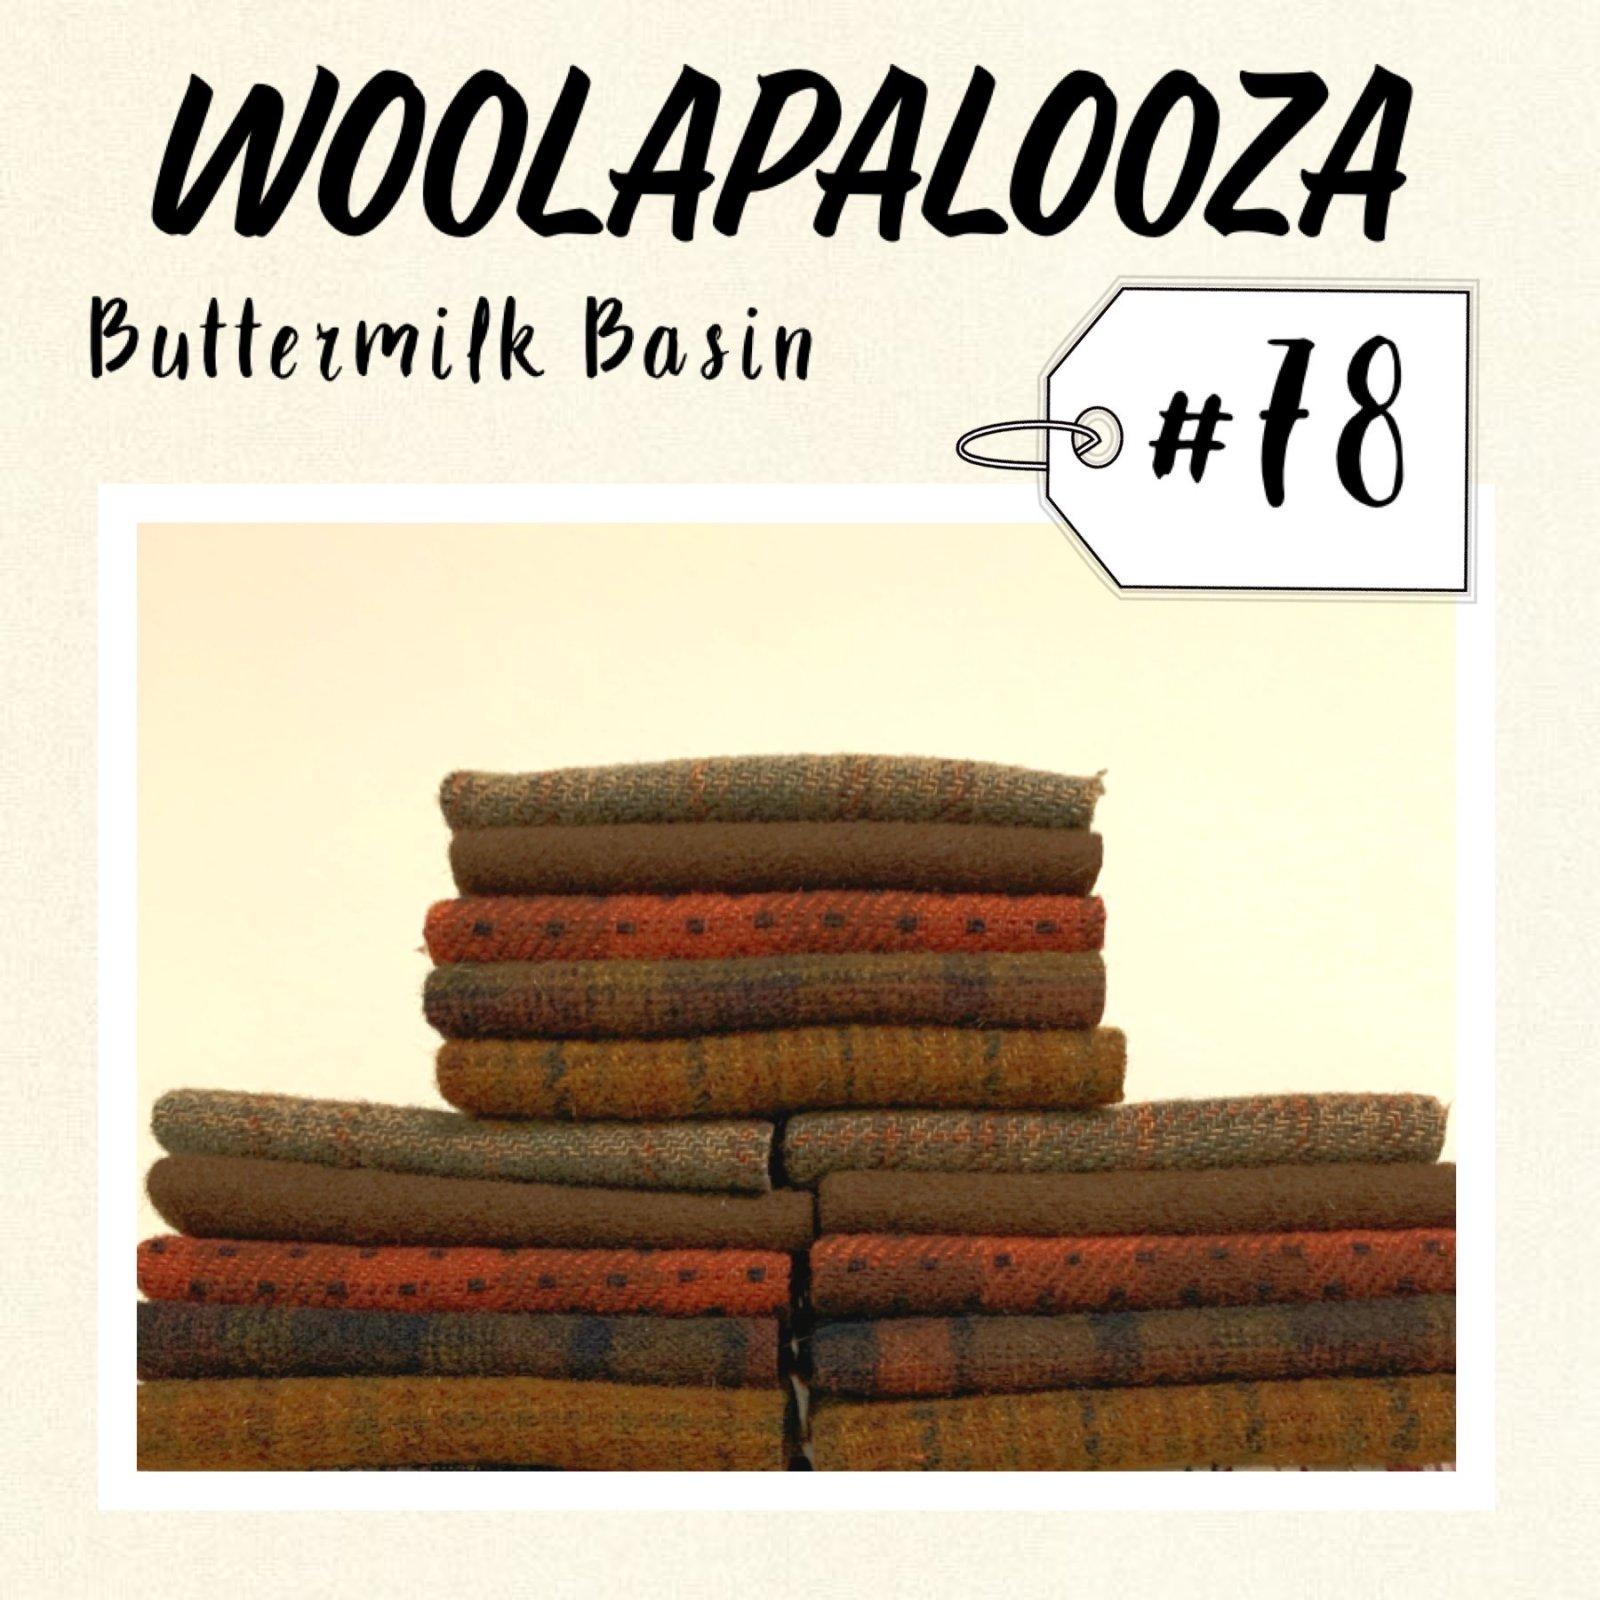 Woolapalooza #78 Wool Bundle